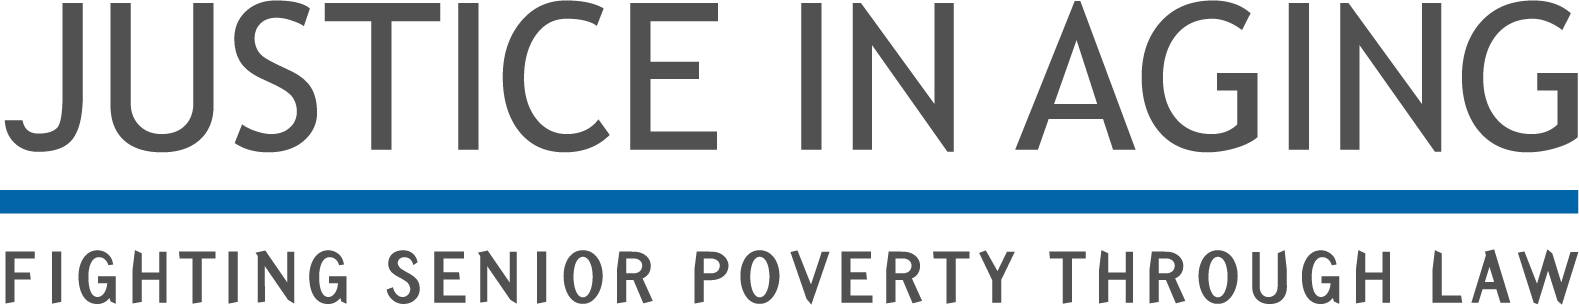 Civic Sponsor